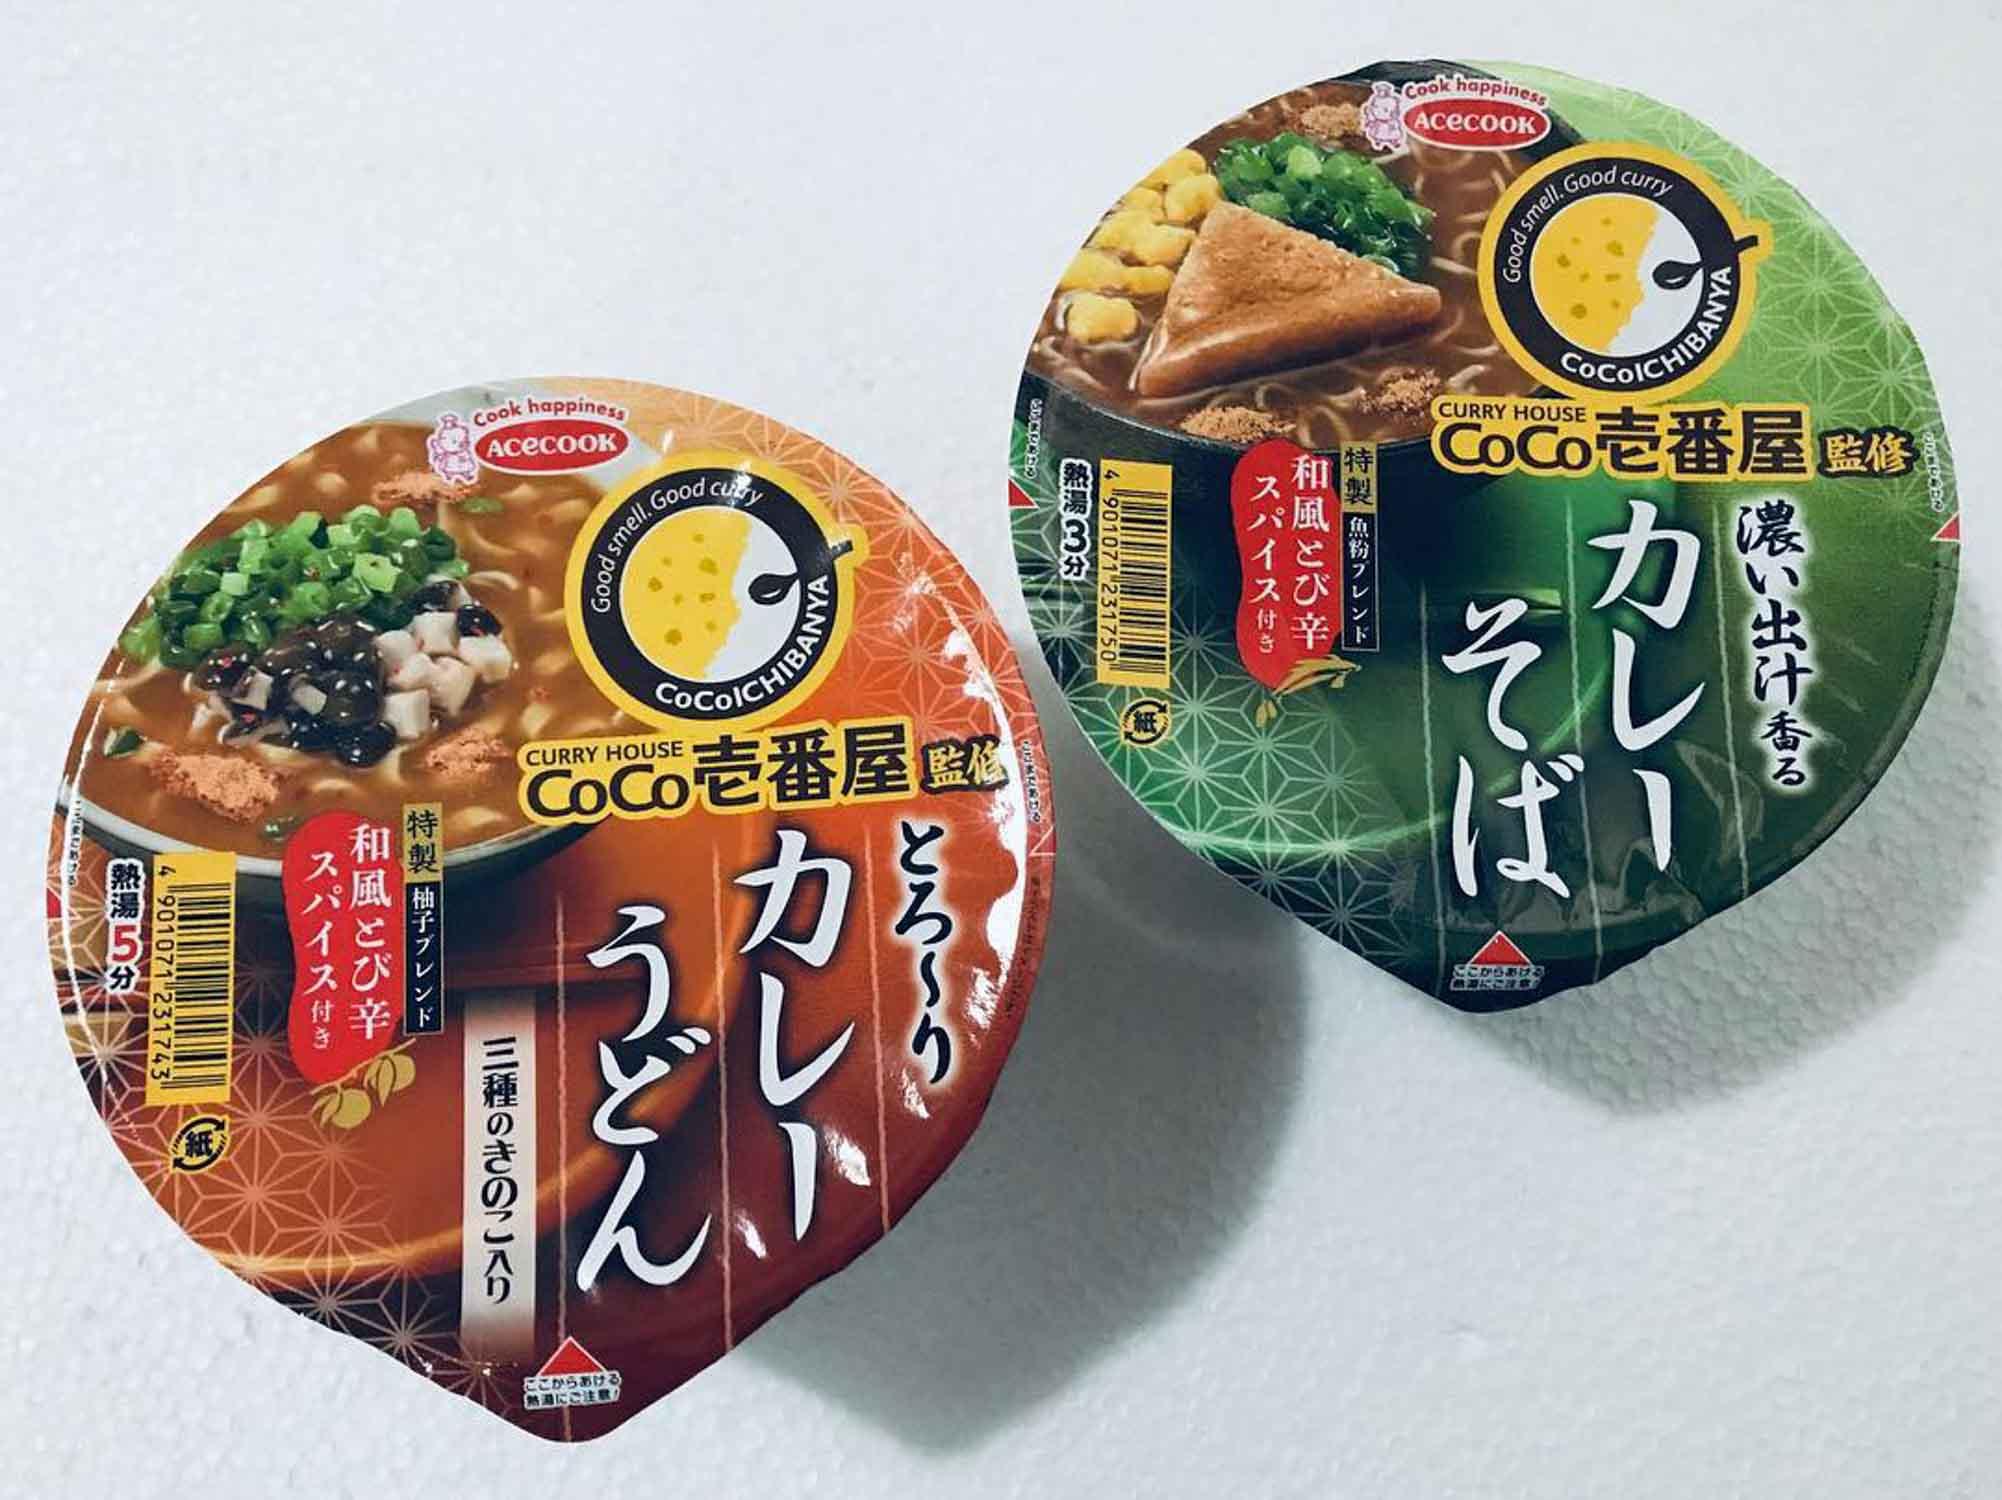 Coco Ichibanya Curry Udon